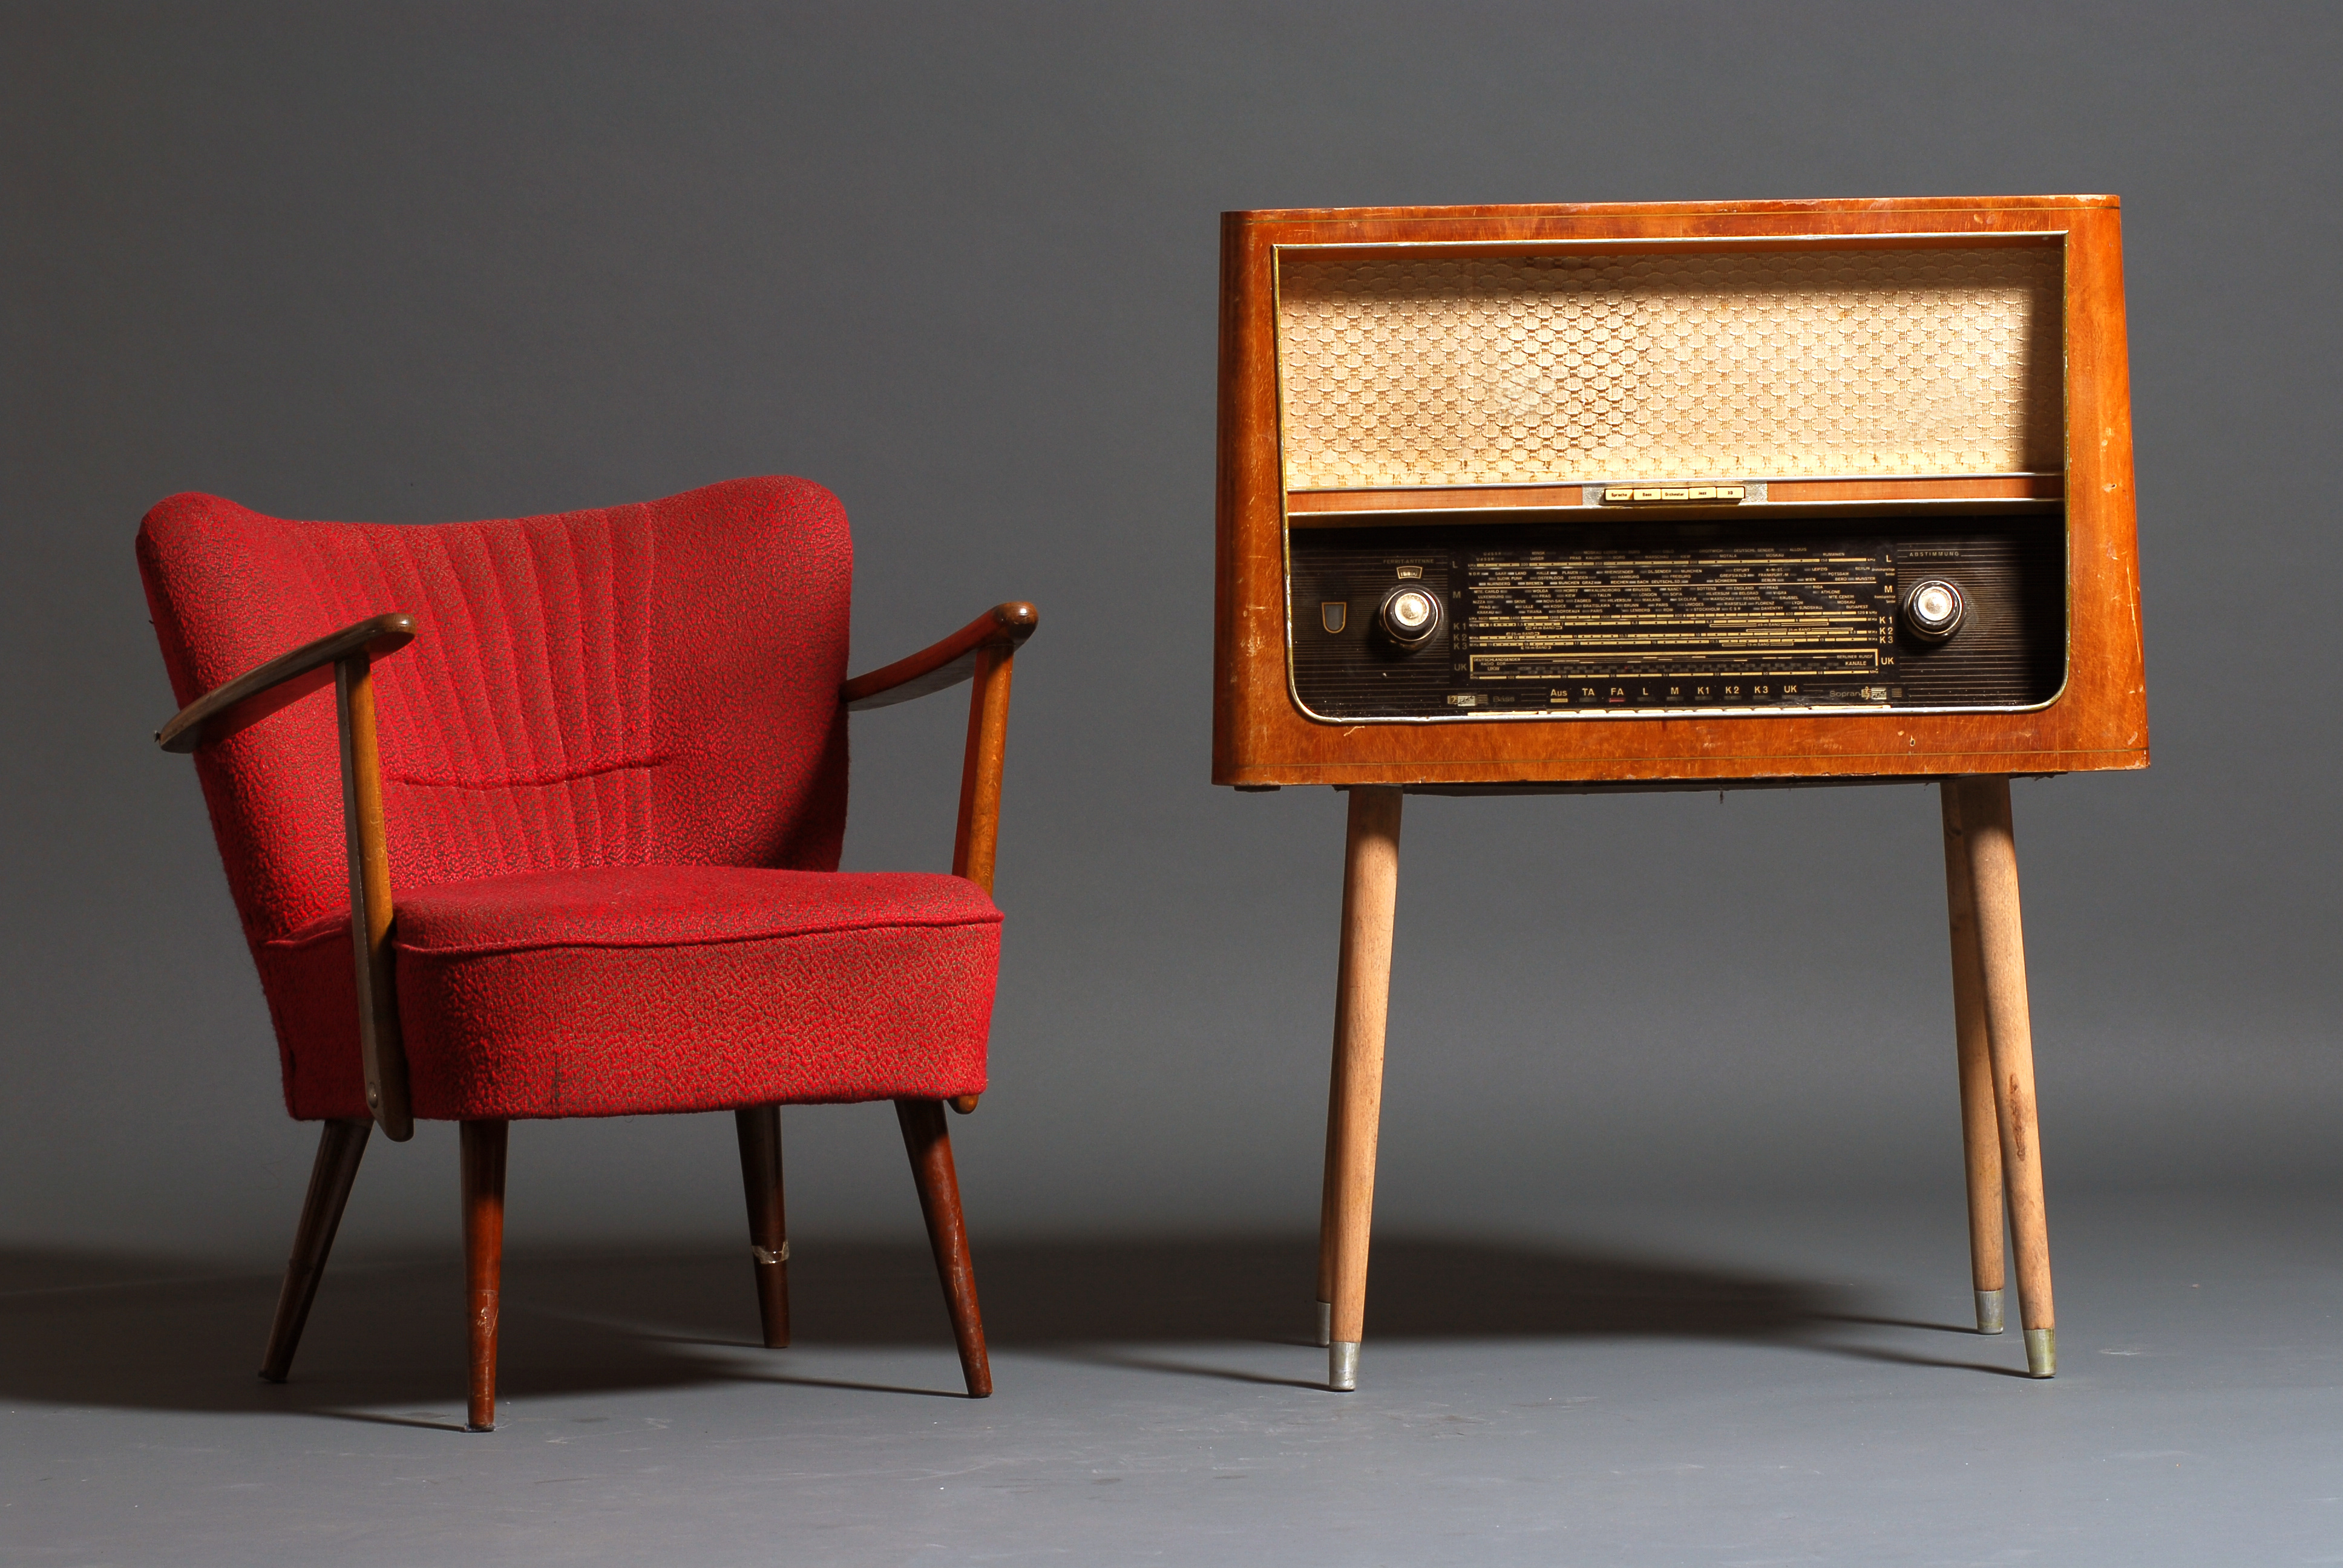 Vintage Radio And Armchair Trio De Janeiro